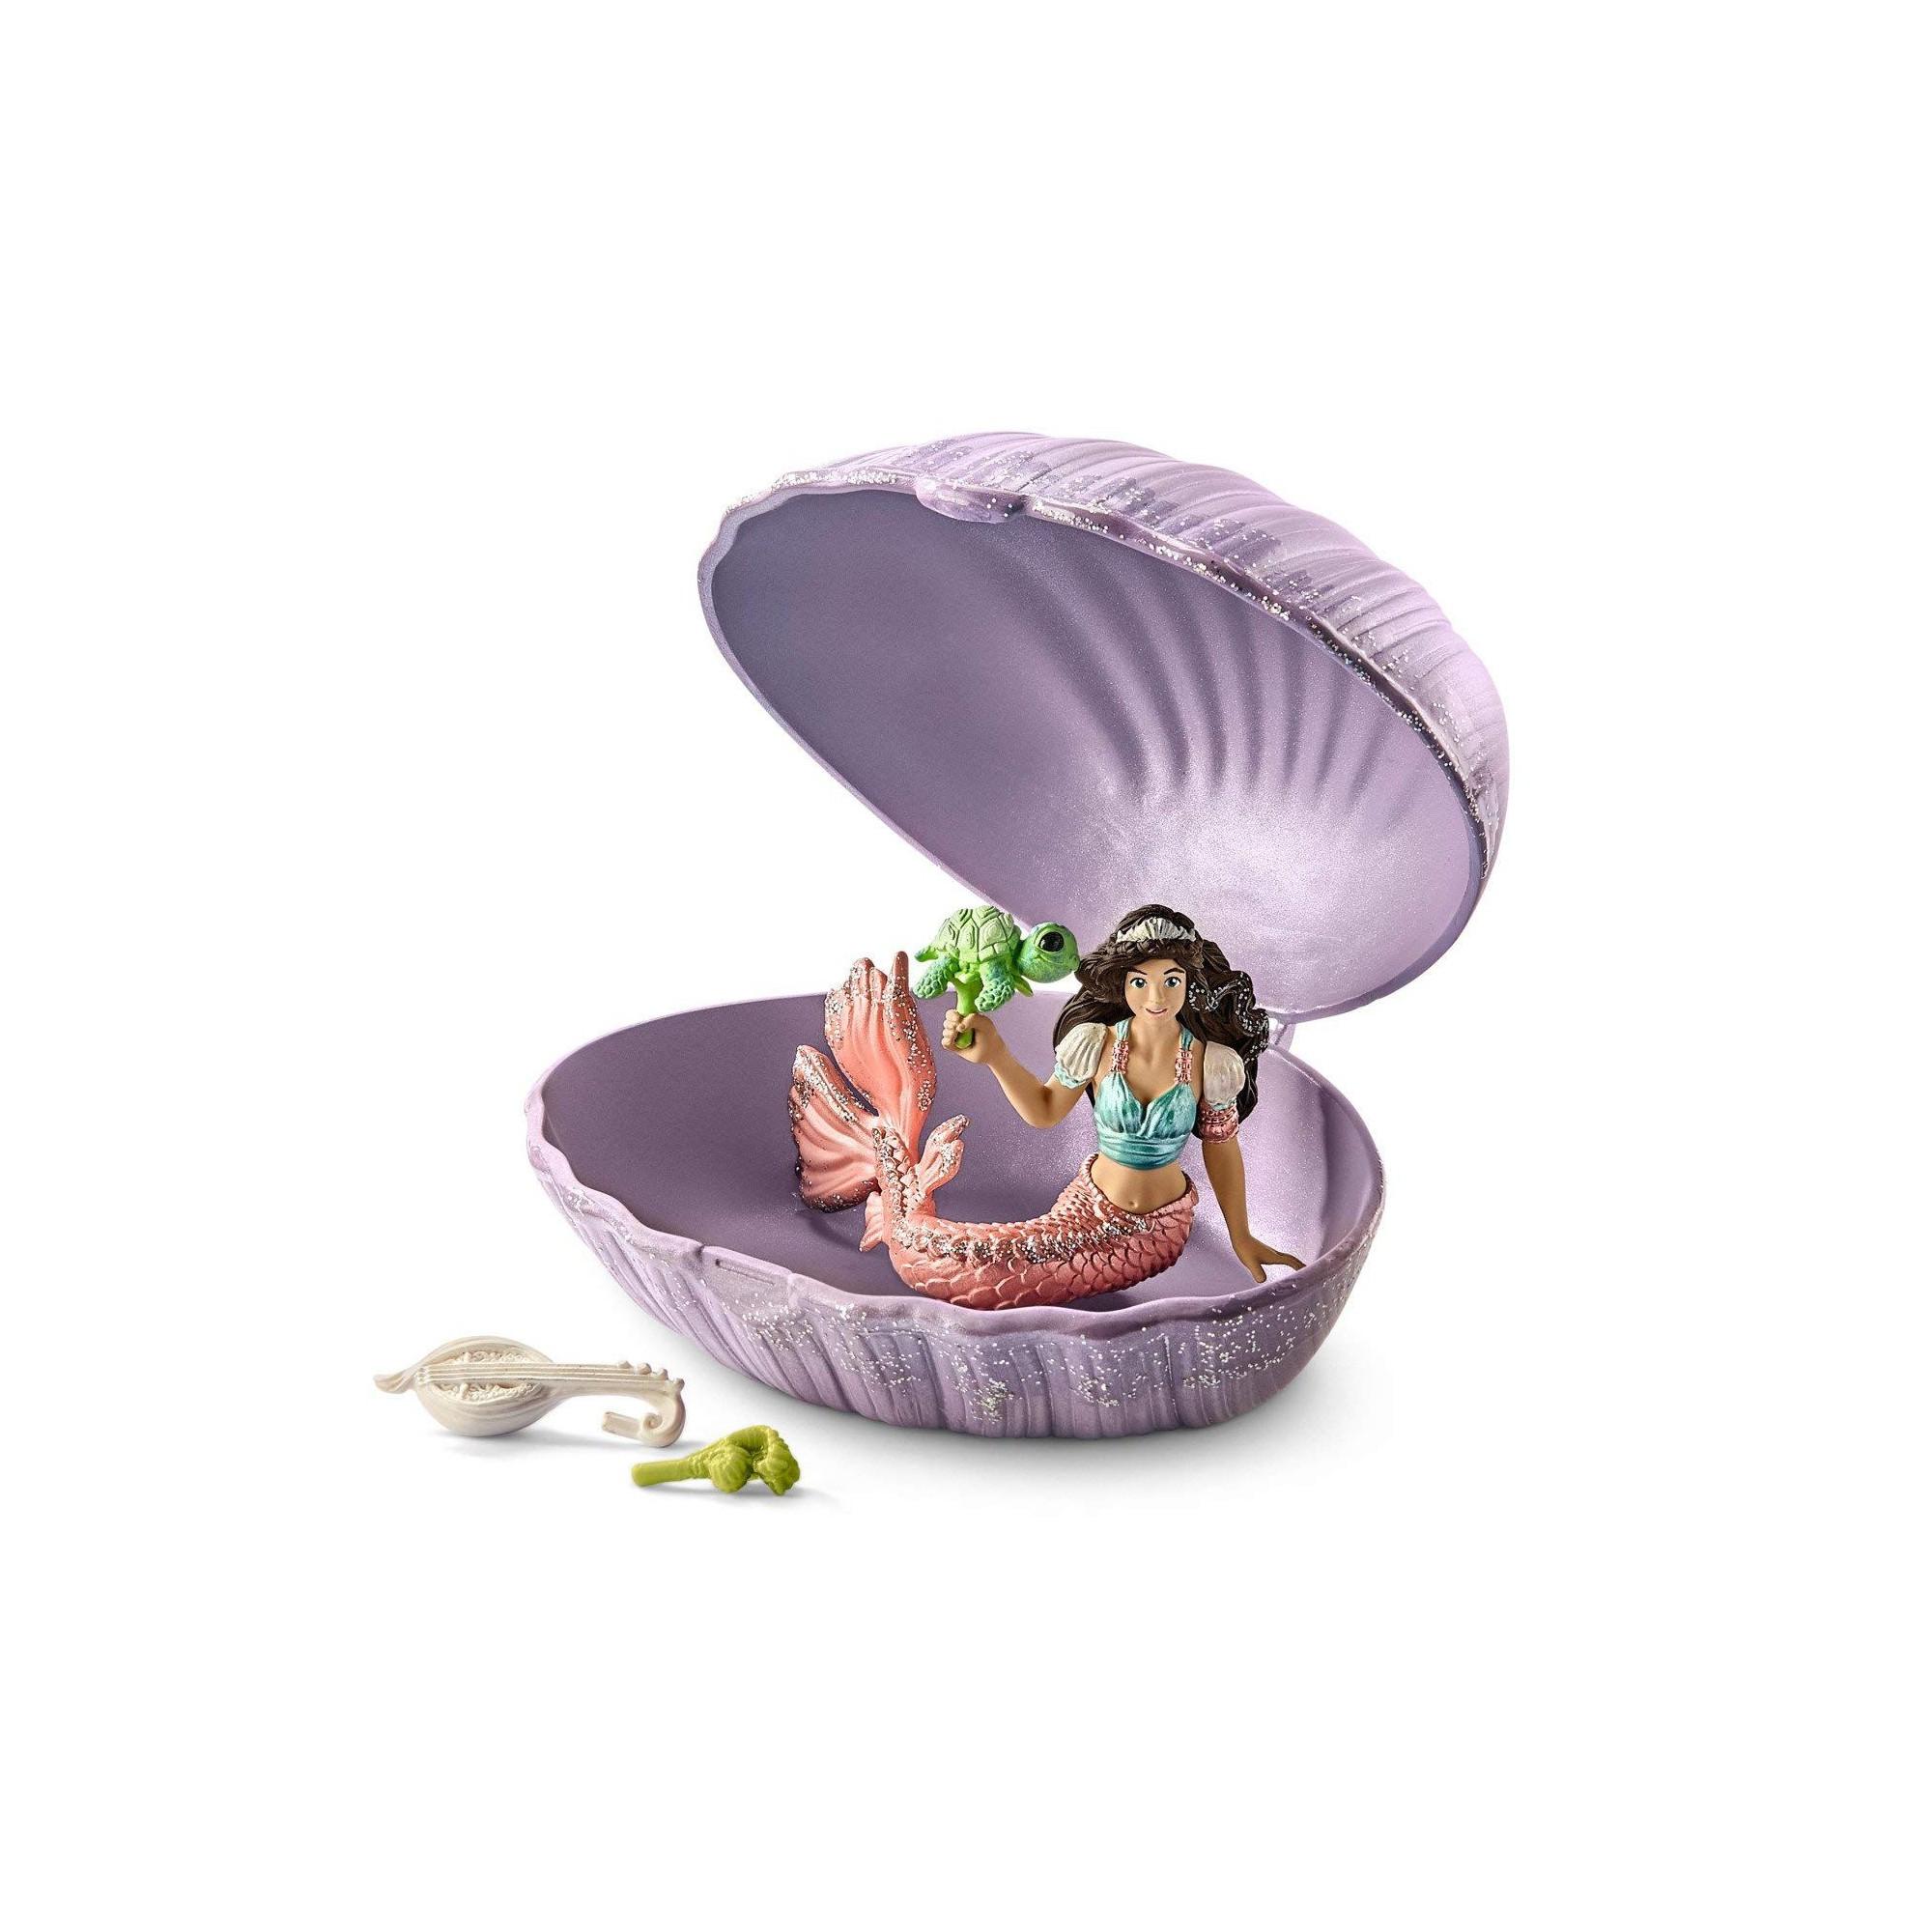 Schleich Mermaid with Turtle Figure Toy Figure 70562 New 2018 Bayala